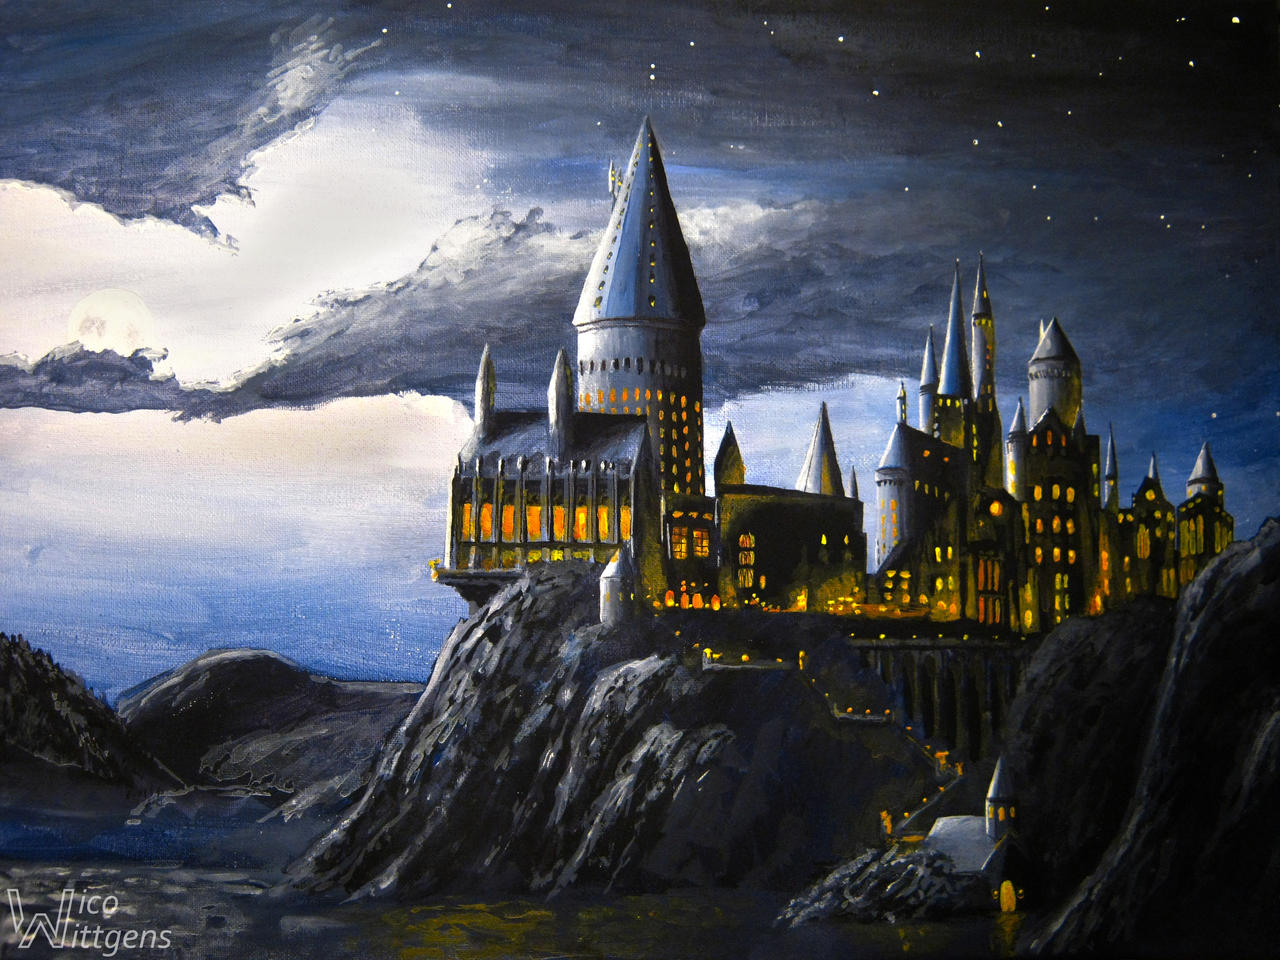 Hogwarts At Night By NicoW92 On DeviantArt